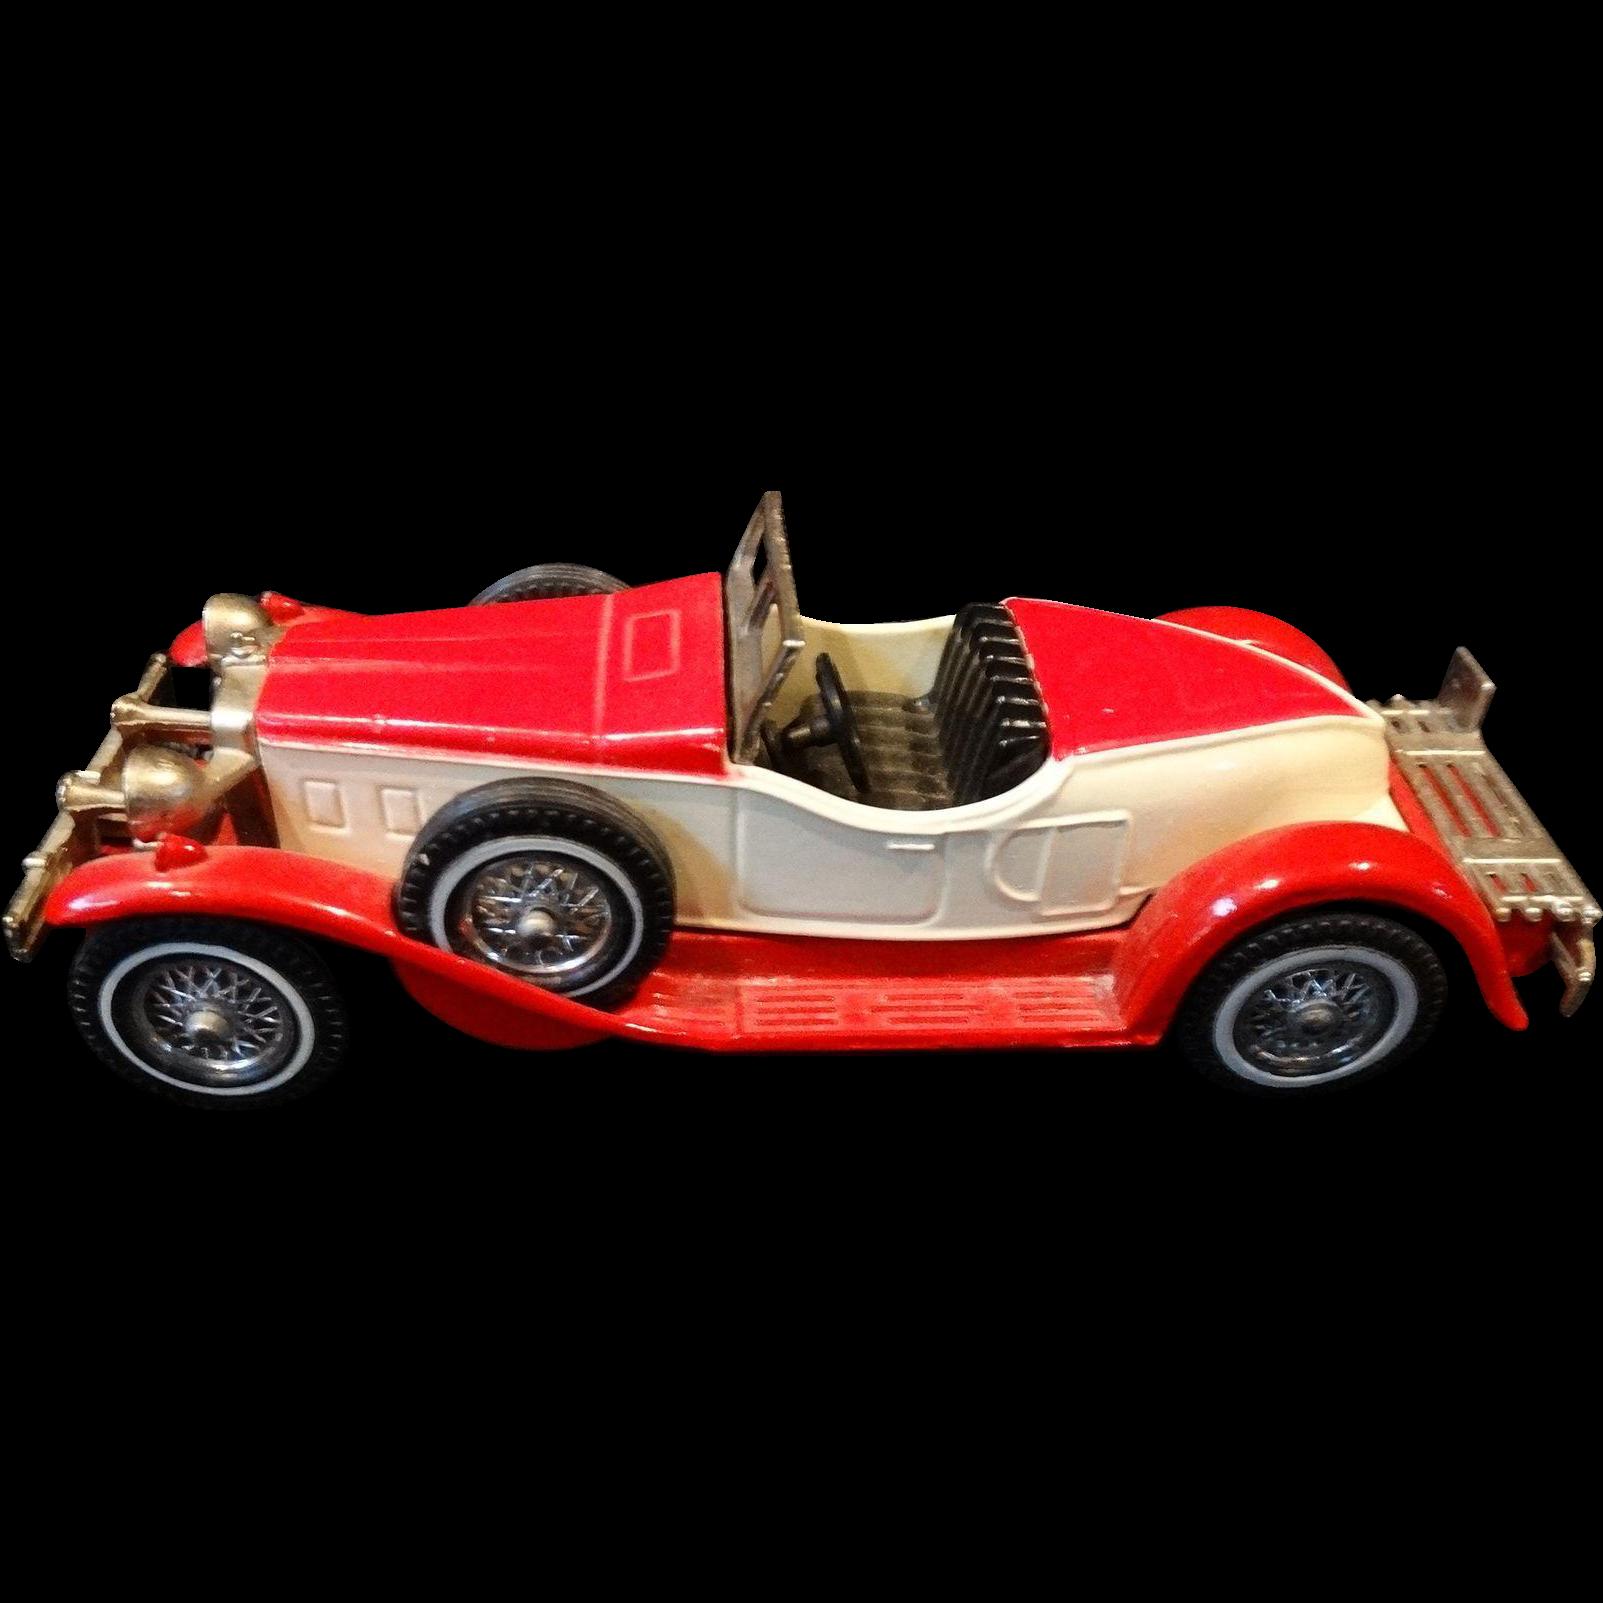 1978 Matchbox LESNEY Models of Yesteryear 1:44 scale Y14 1931 Stutz Bearcat